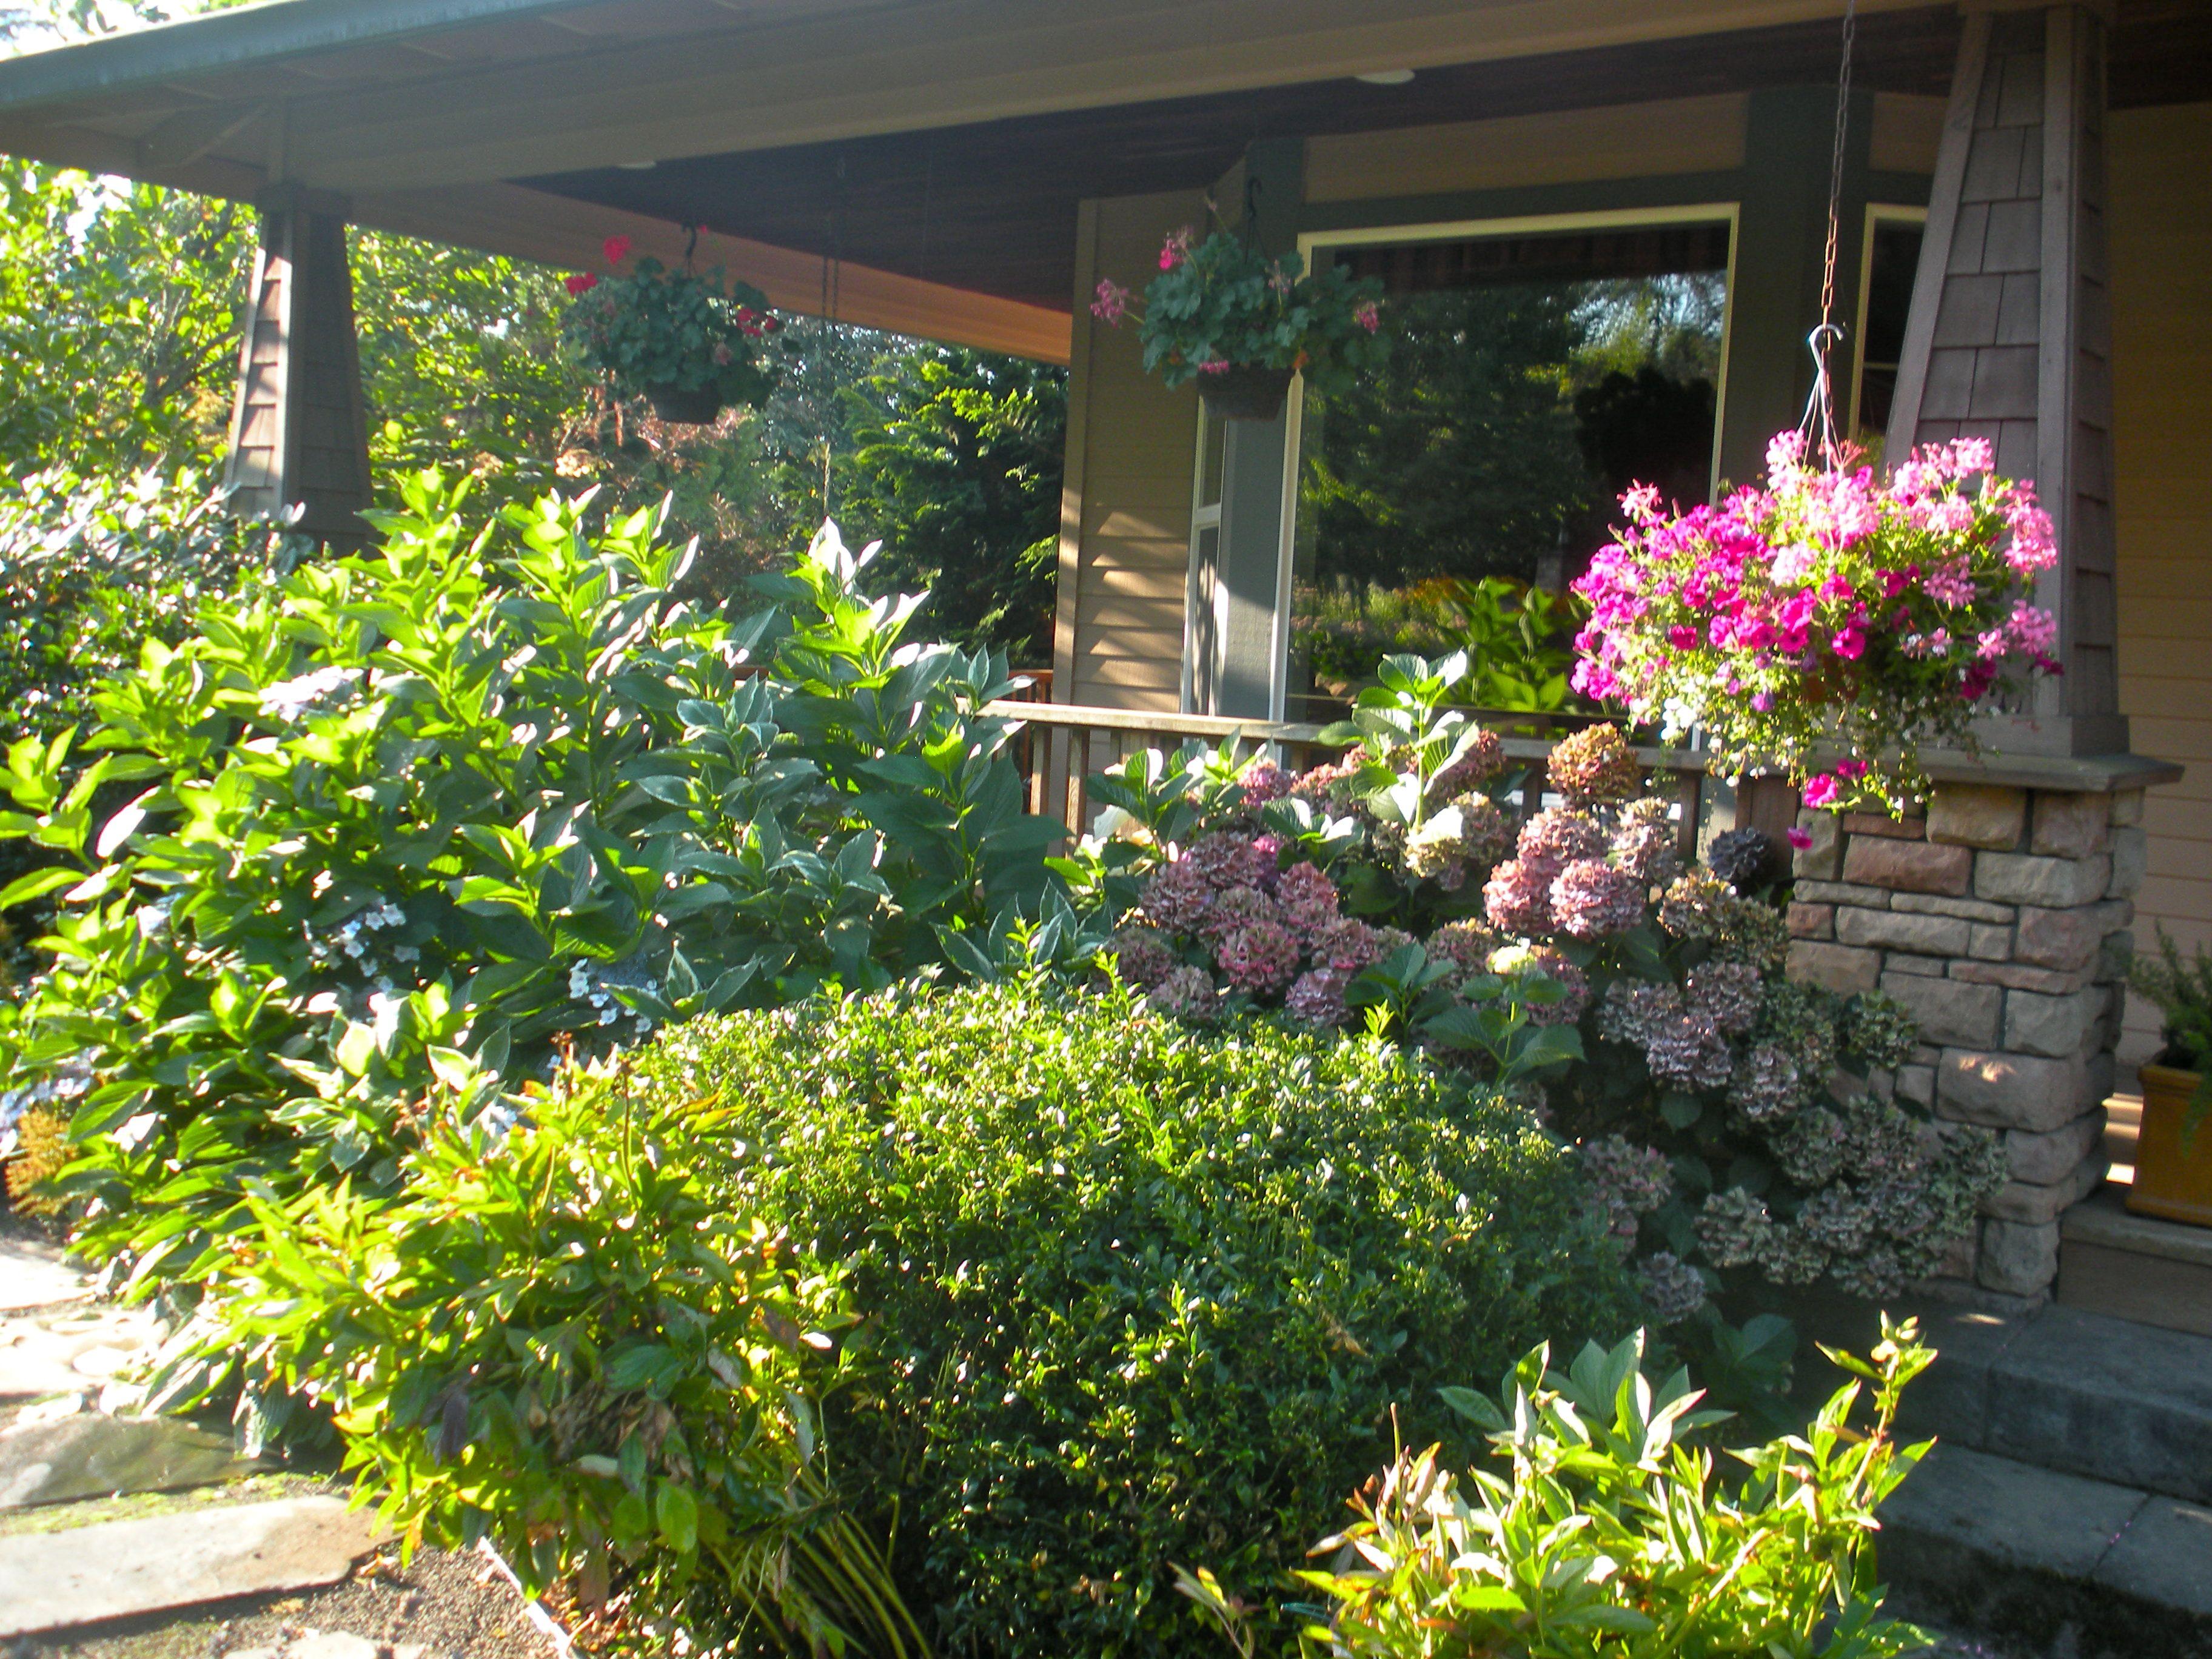 Layered hydrangeas, camellias, rhododendrons, astilbes, hostas. Shady front porch garden.